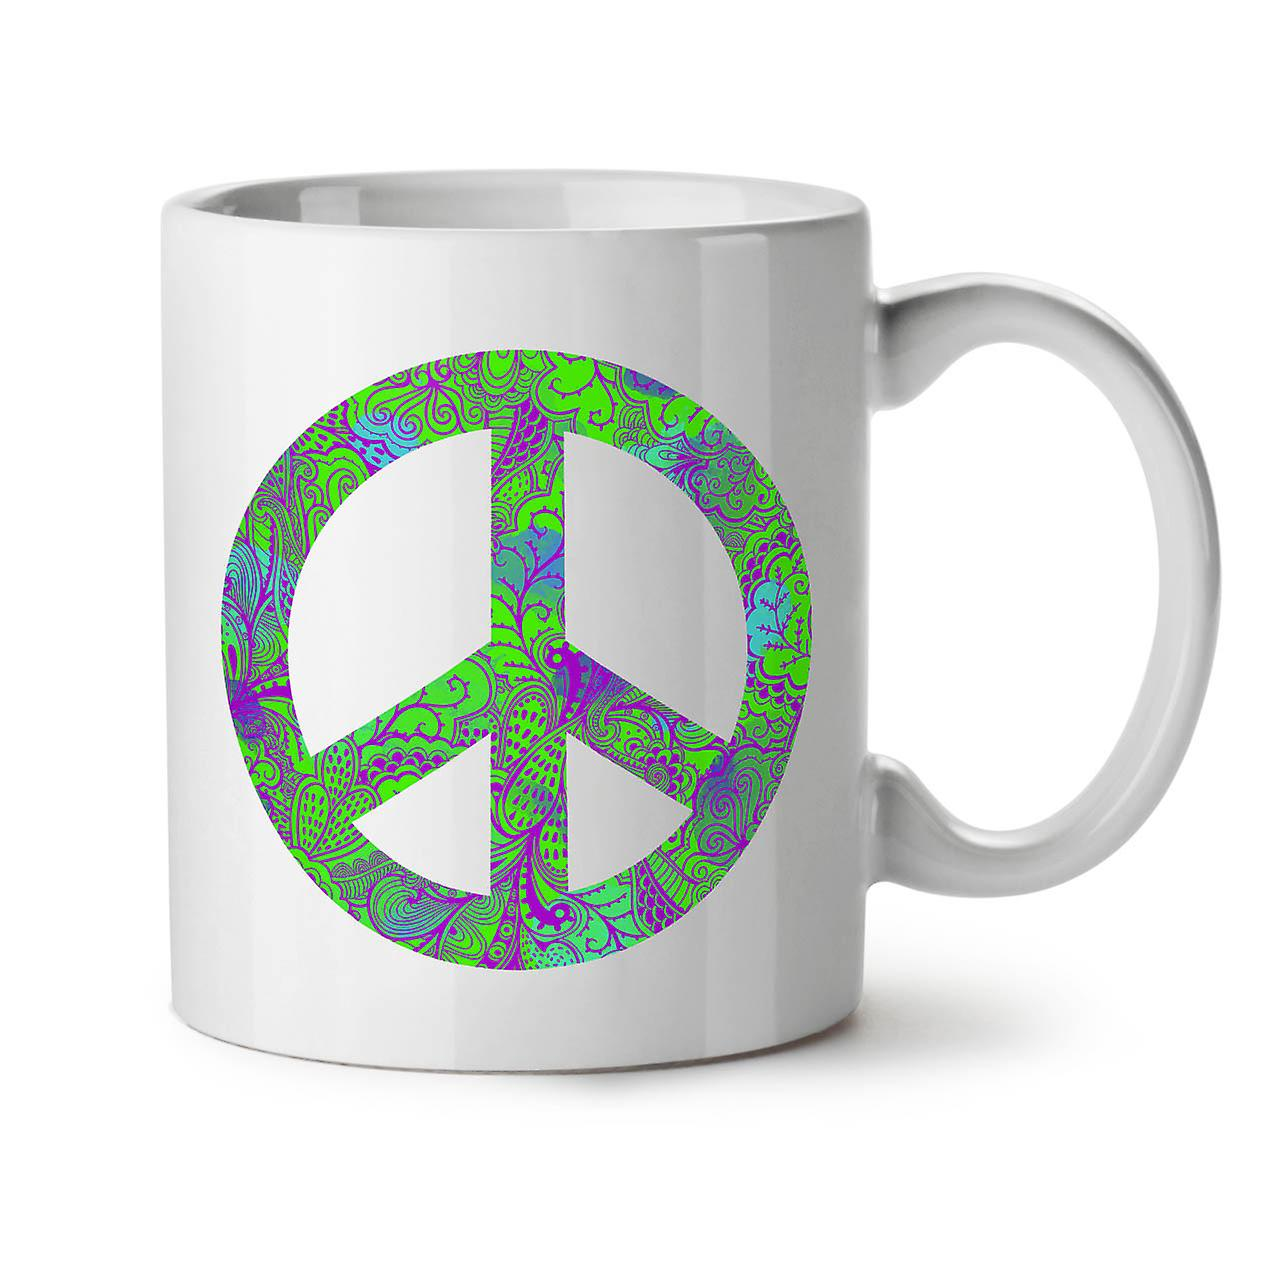 Nouveau Hippie Tasse OzWellcoda Blanc Forever Café 11 Thé Céramique Peace oxBhsQdCtr